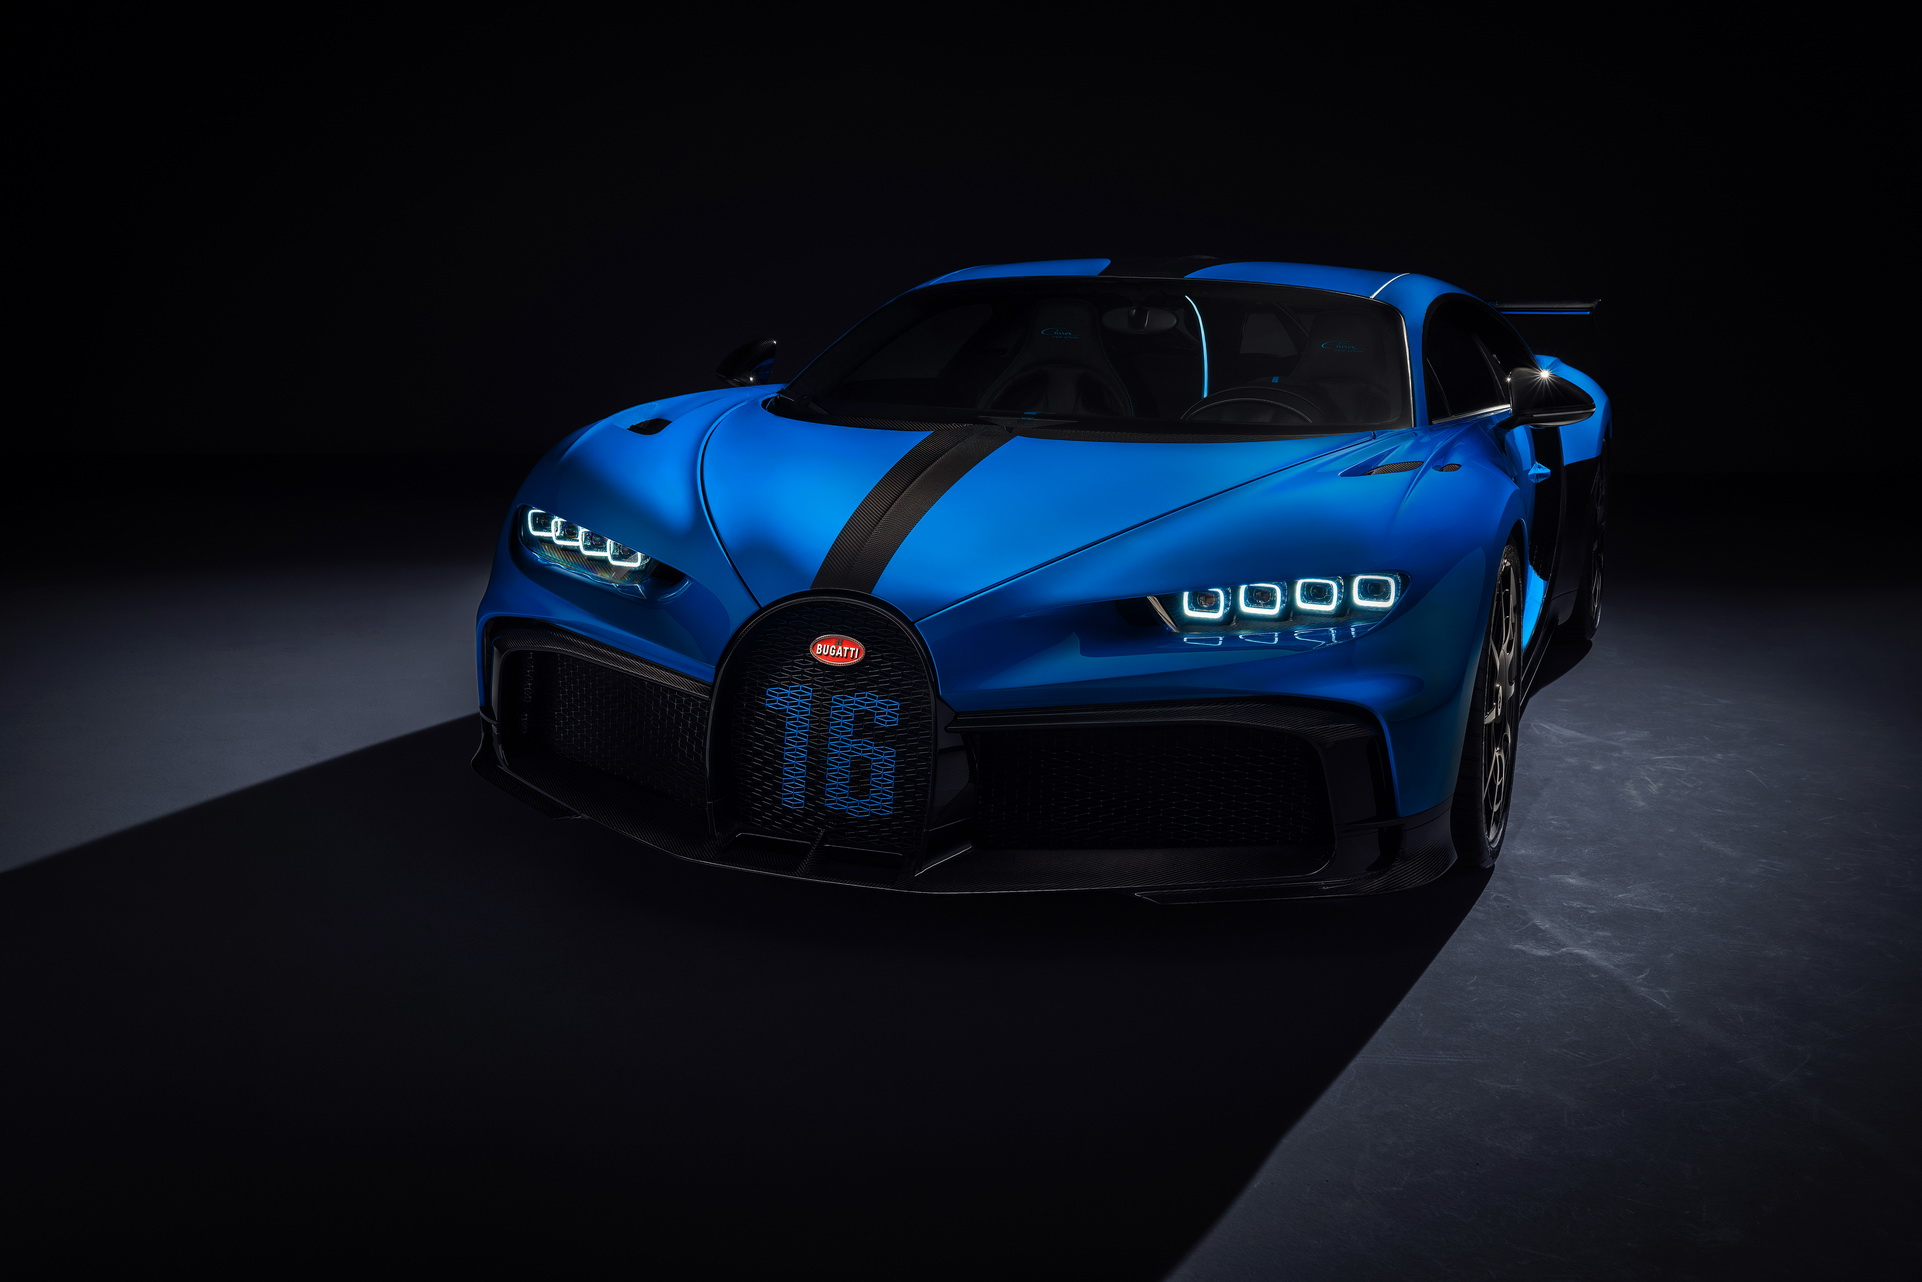 bugatti-chiron-pur-sport-3-1.jpg